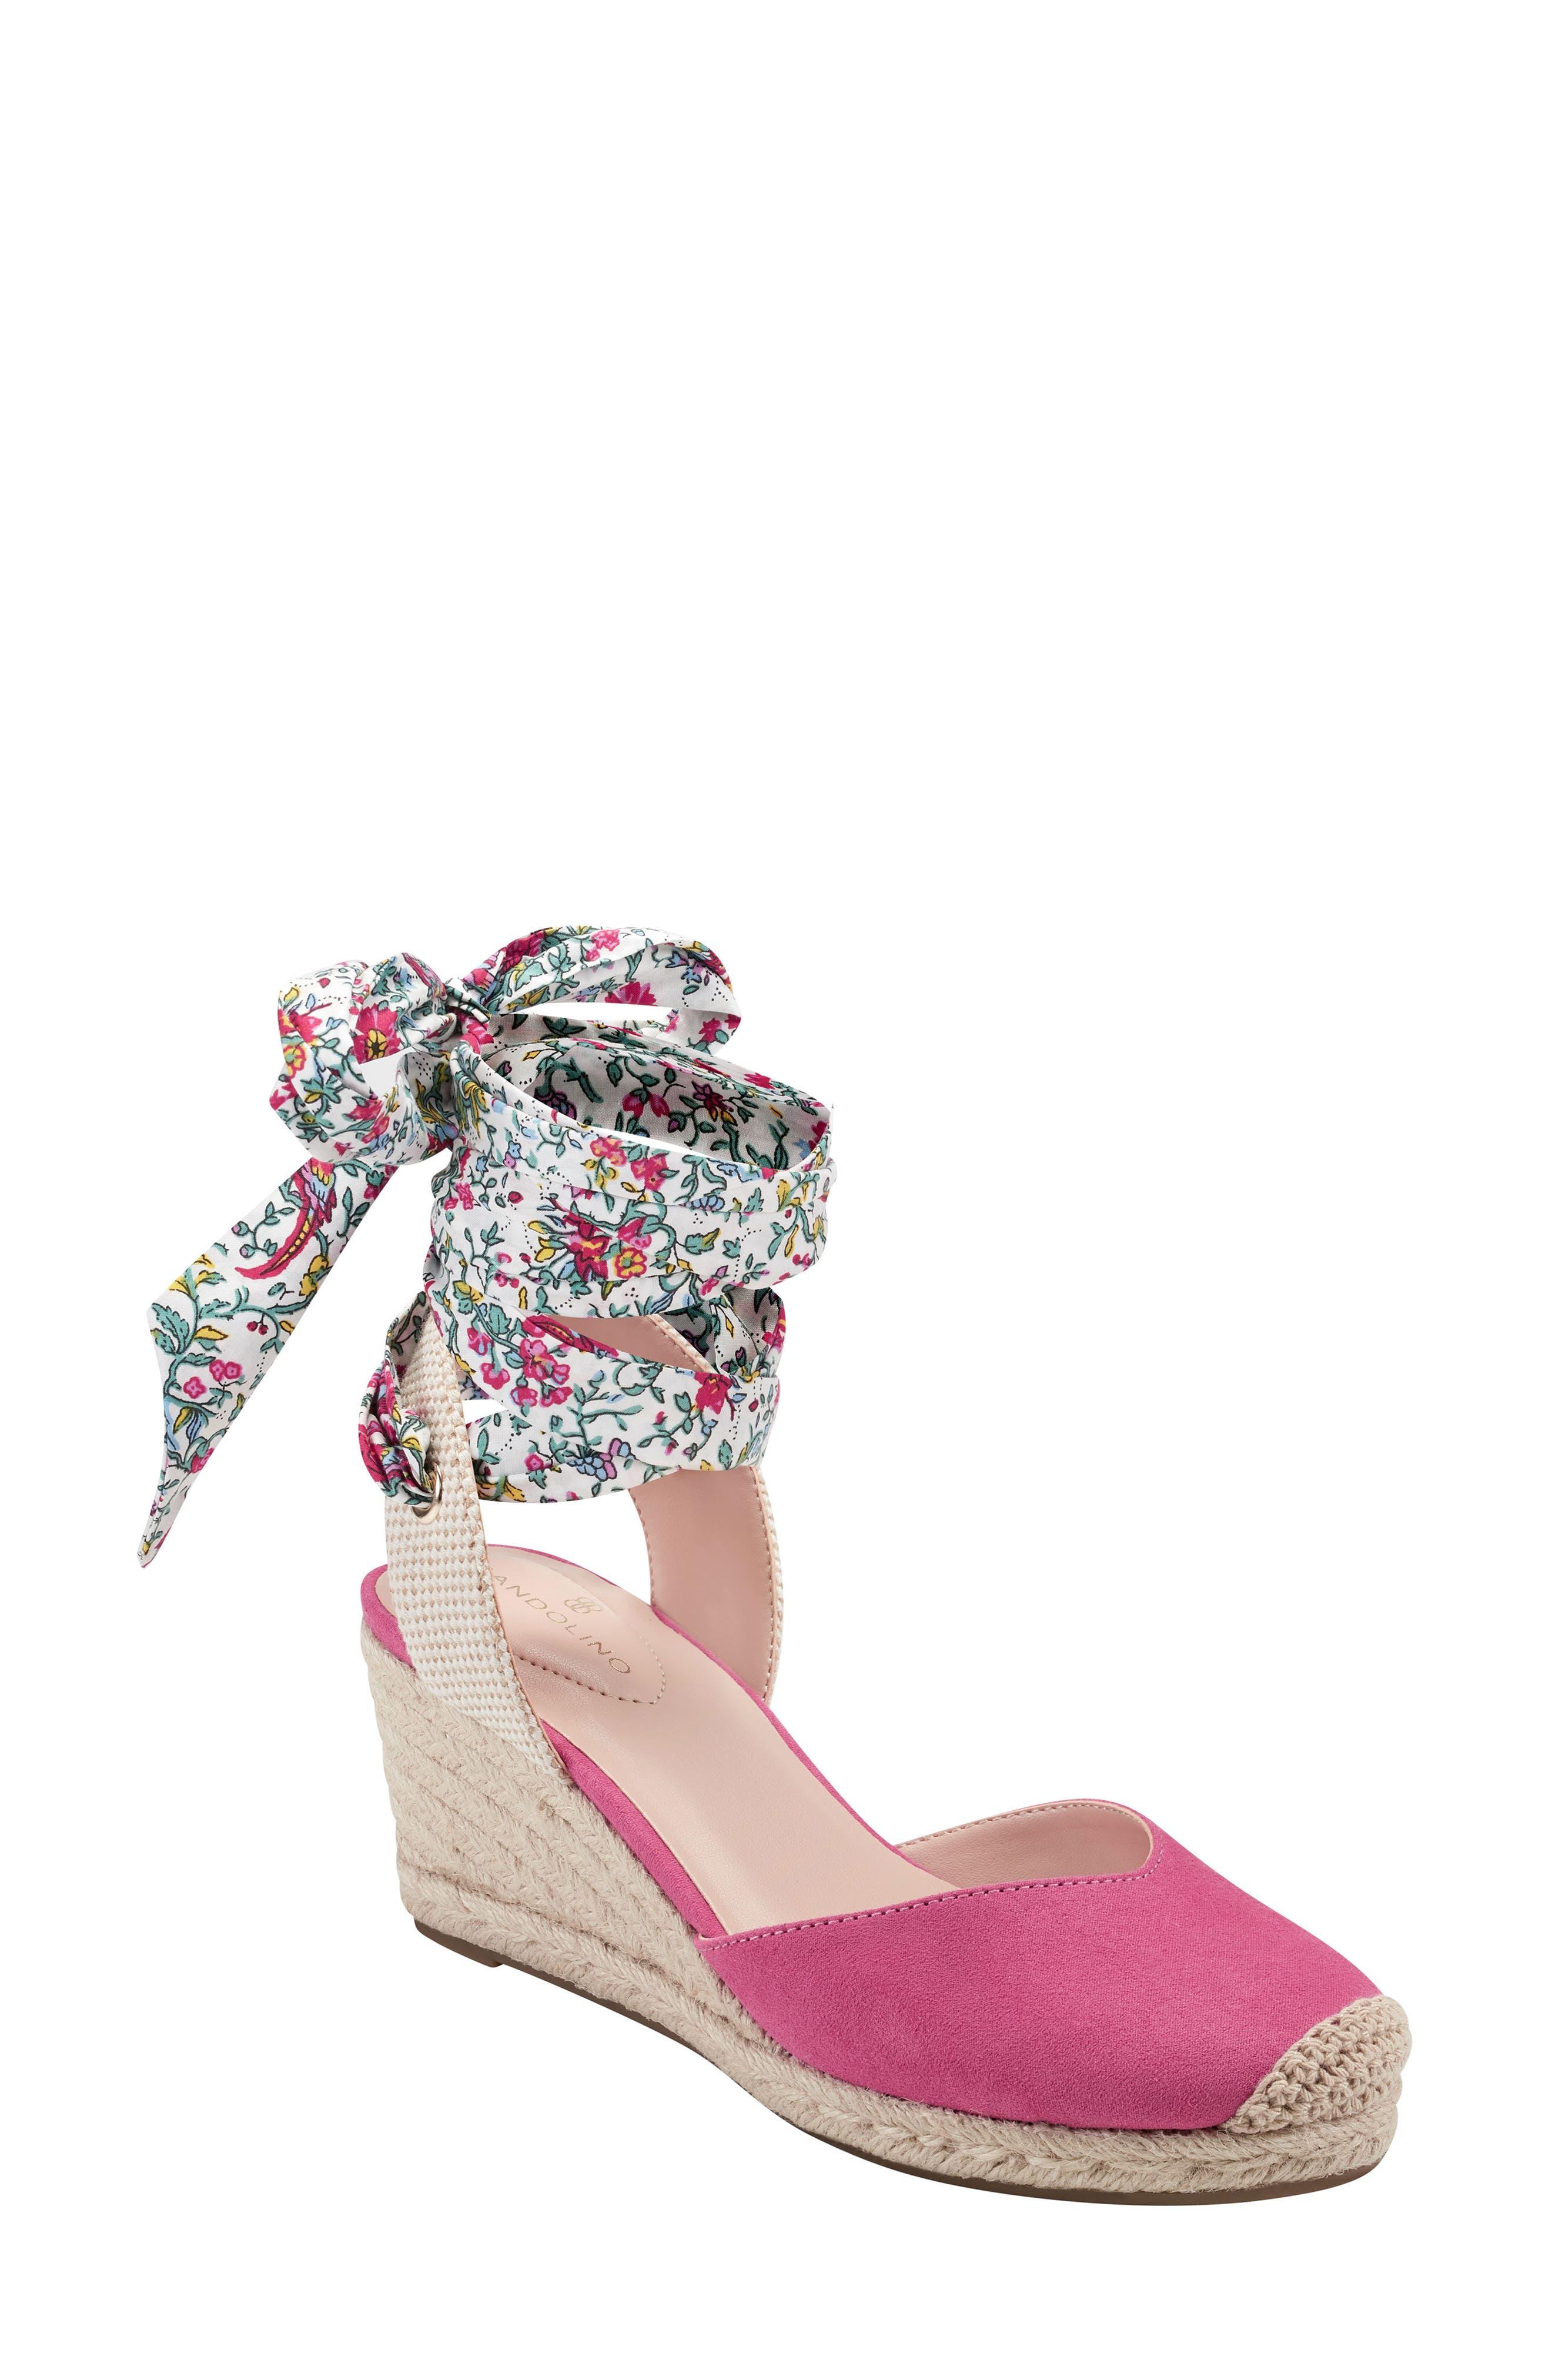 Nettie Espadrille Wedge Sandal